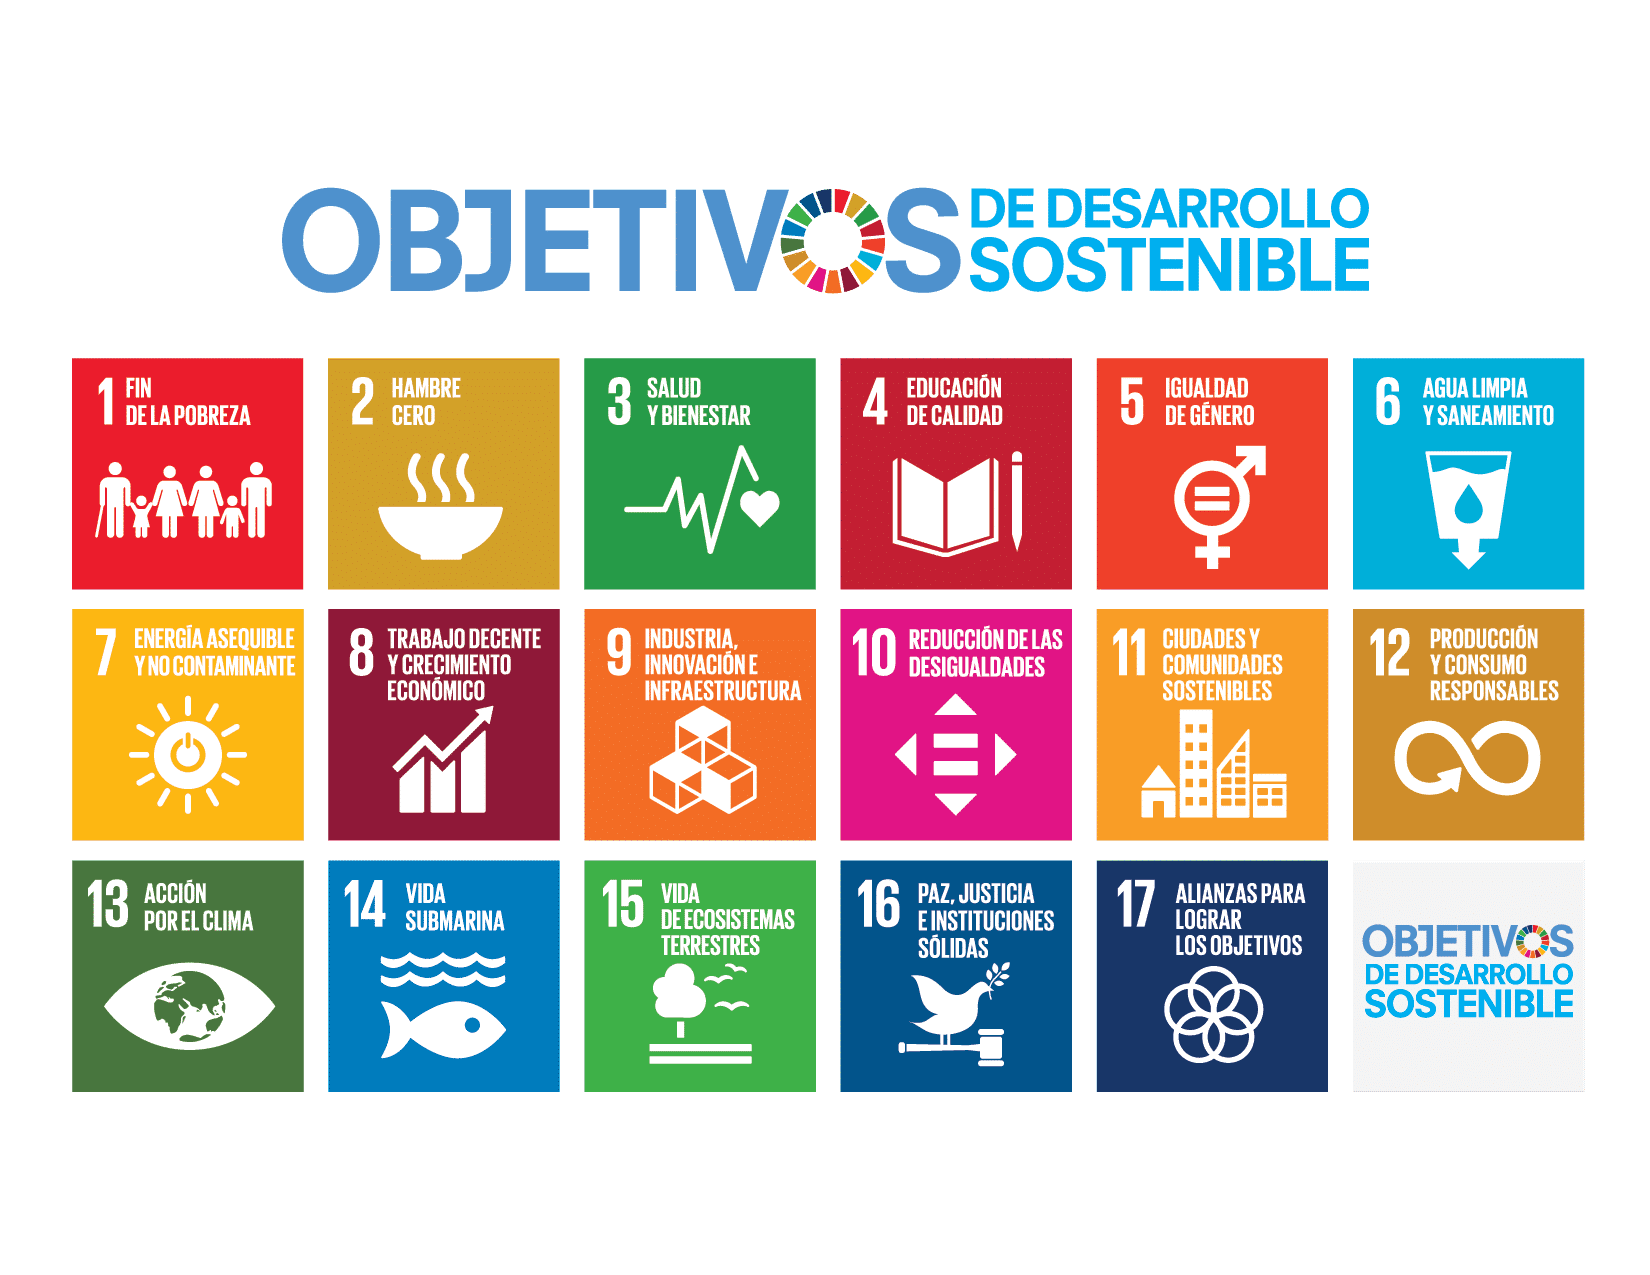 Poster_Objetivos_Desarrollo_Sostenible_dLana.png